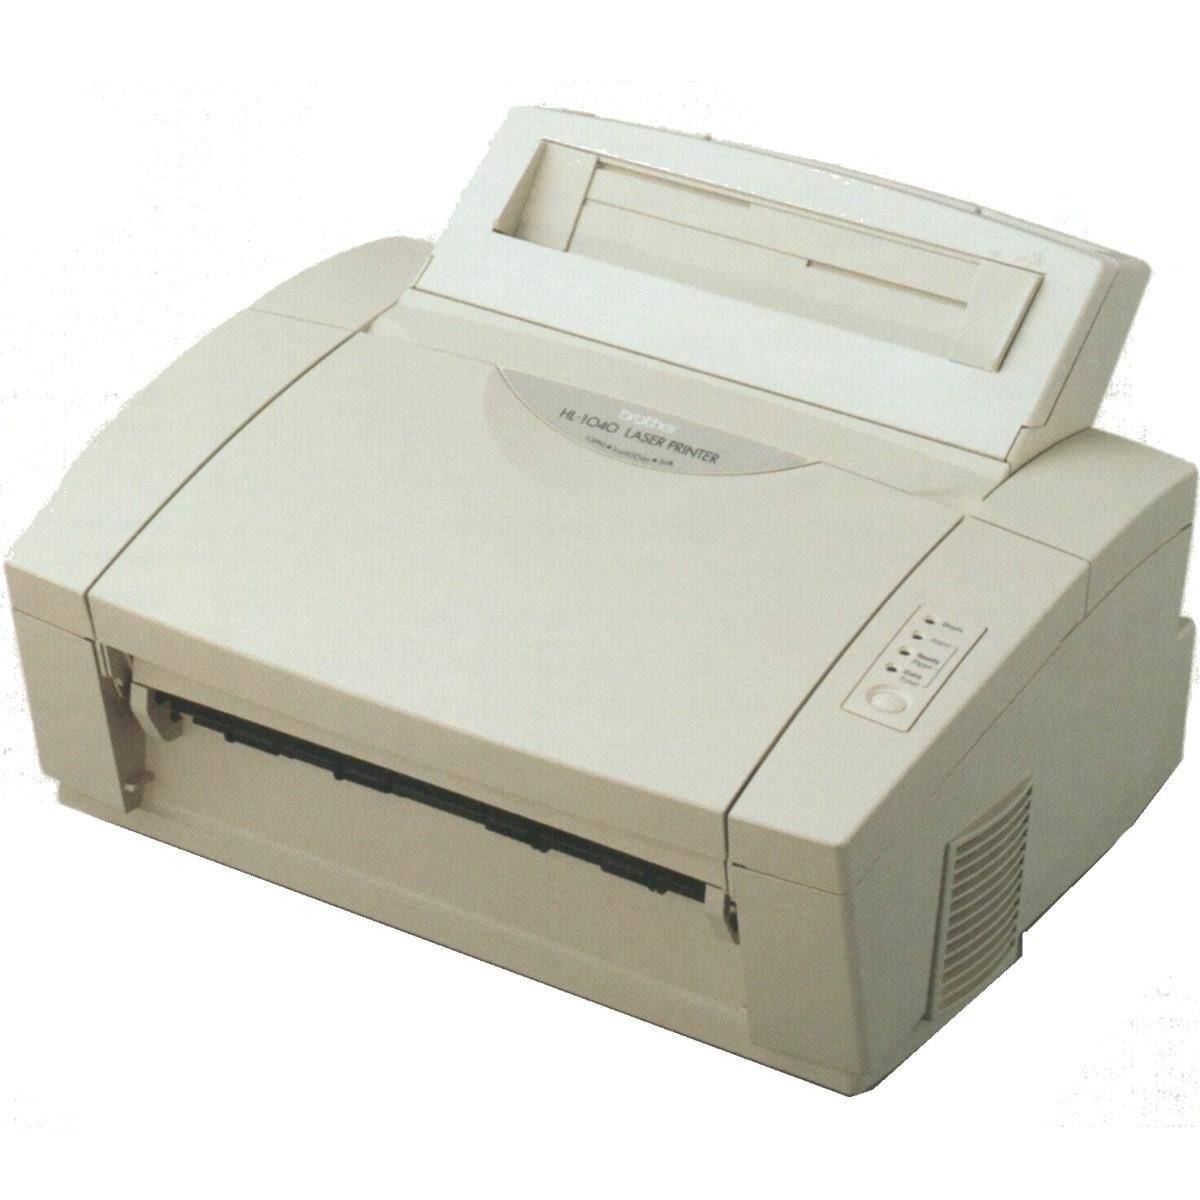 Brother HL-1270N Printer Driver (2019)